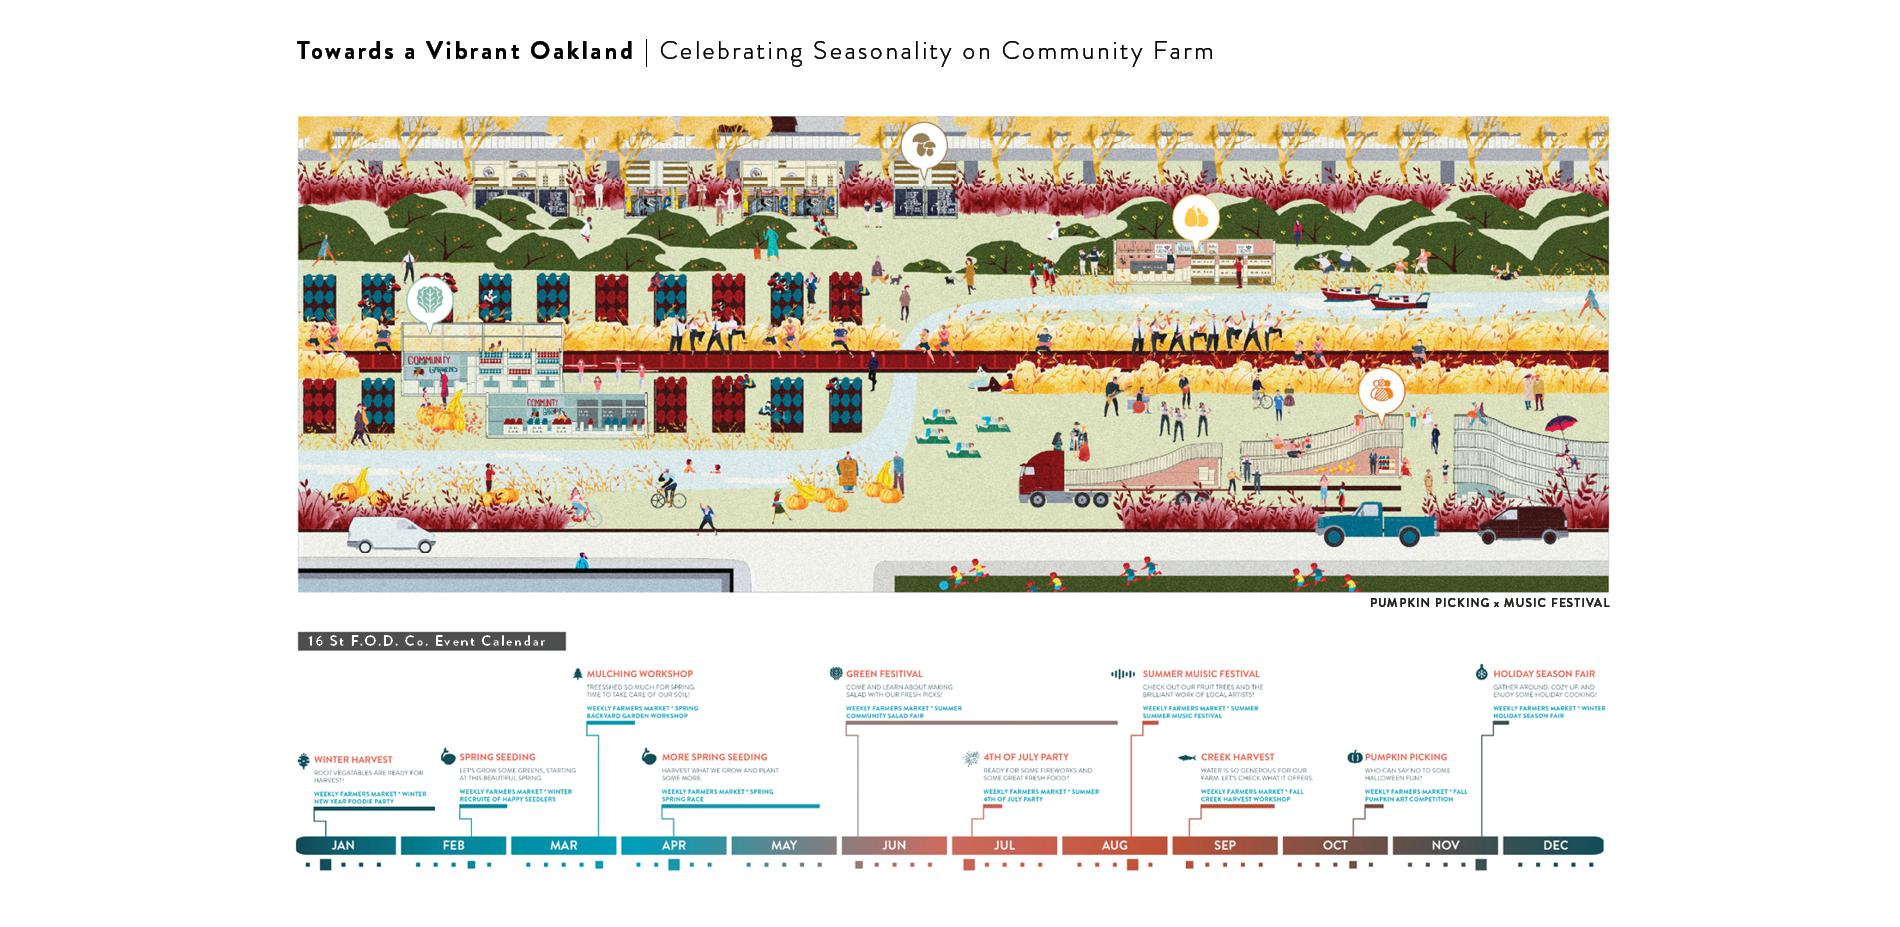 Towards a Vibrant Oakland | Celebrating Seasonality on Community Farm